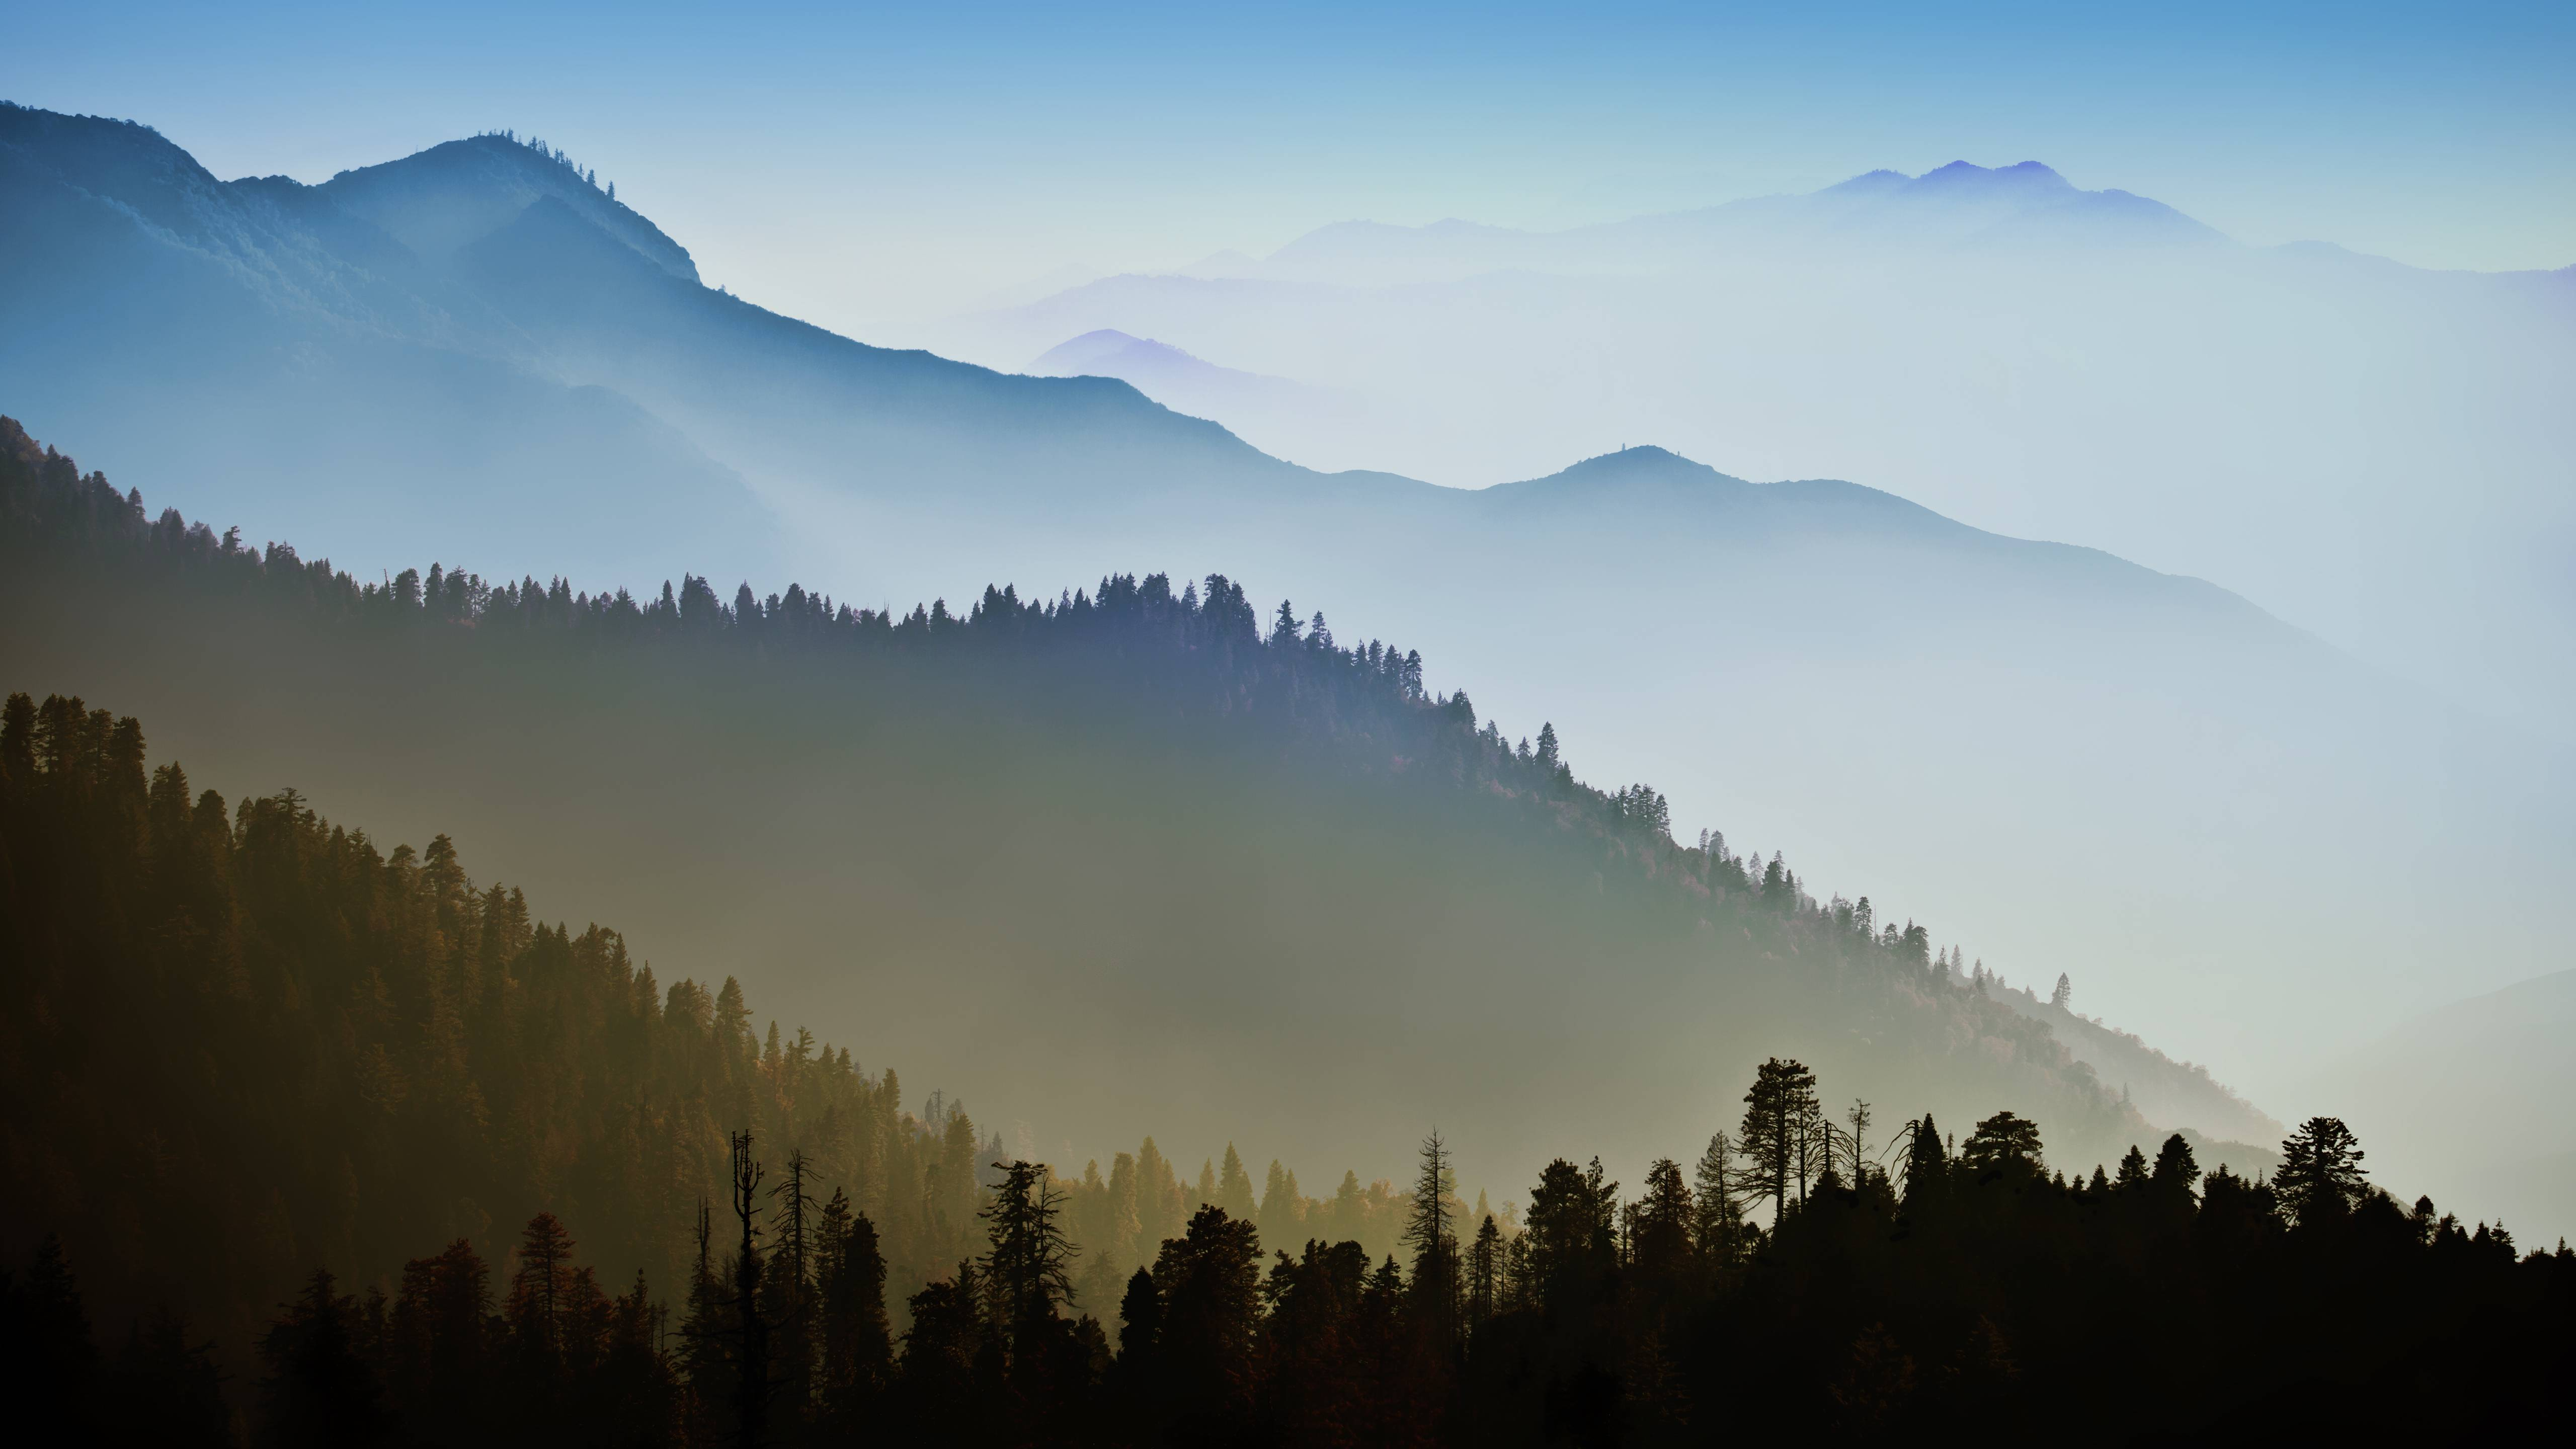 Best Wallpaper Mountain Blue - IgouwDQ  2018_11569.jpg